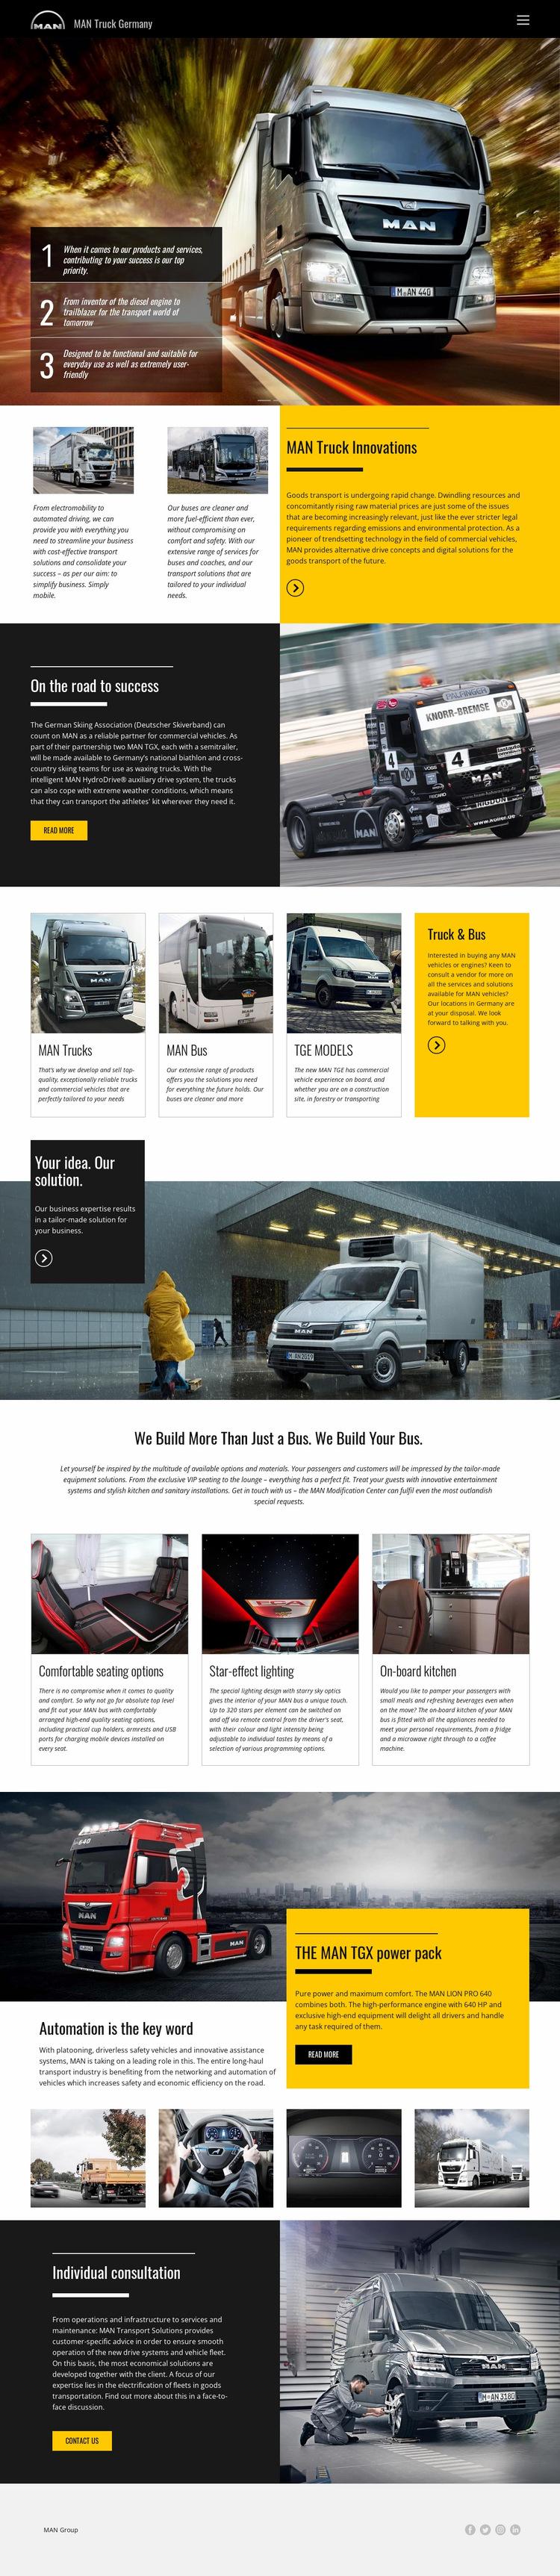 Man trucks for transportation Website Builder